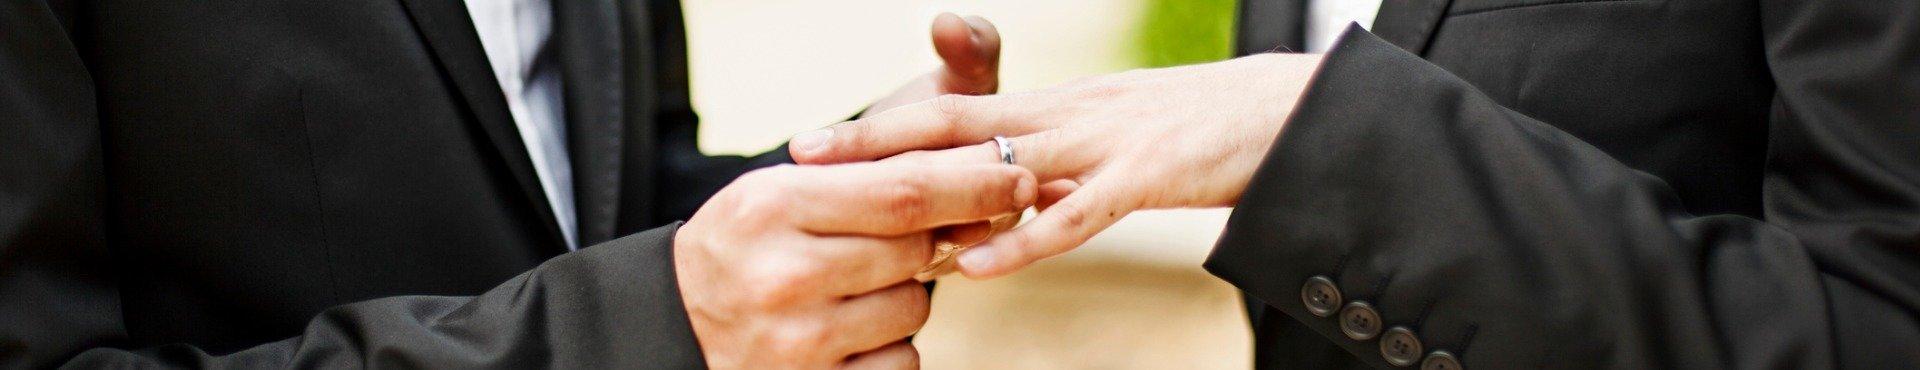 Same sex couple marriage | Shine Lawyers